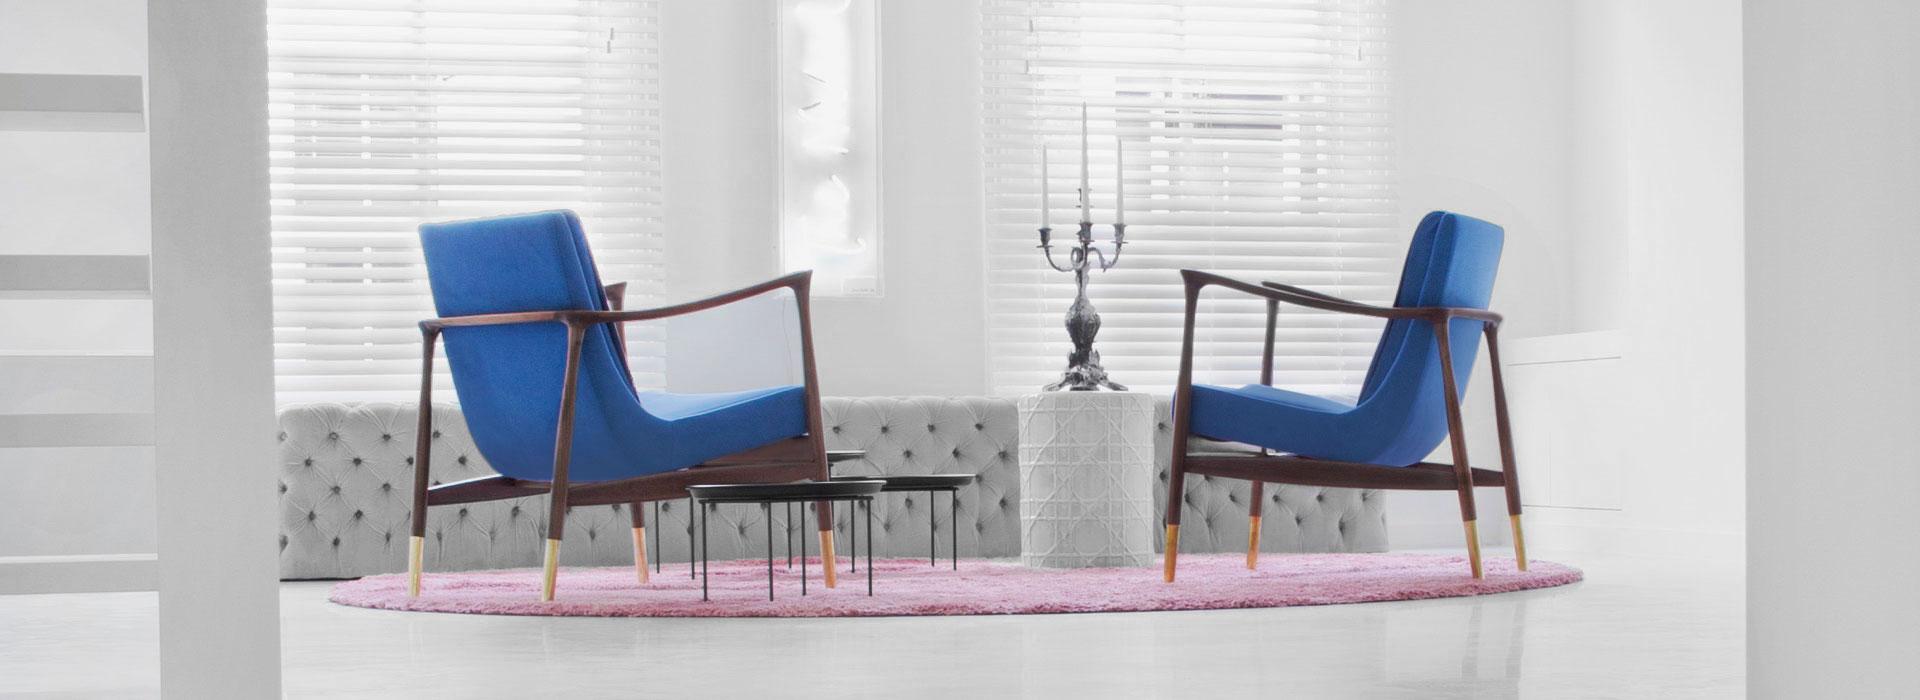 Jimmie Martin Customised Furniture Homeware Art Interior Design